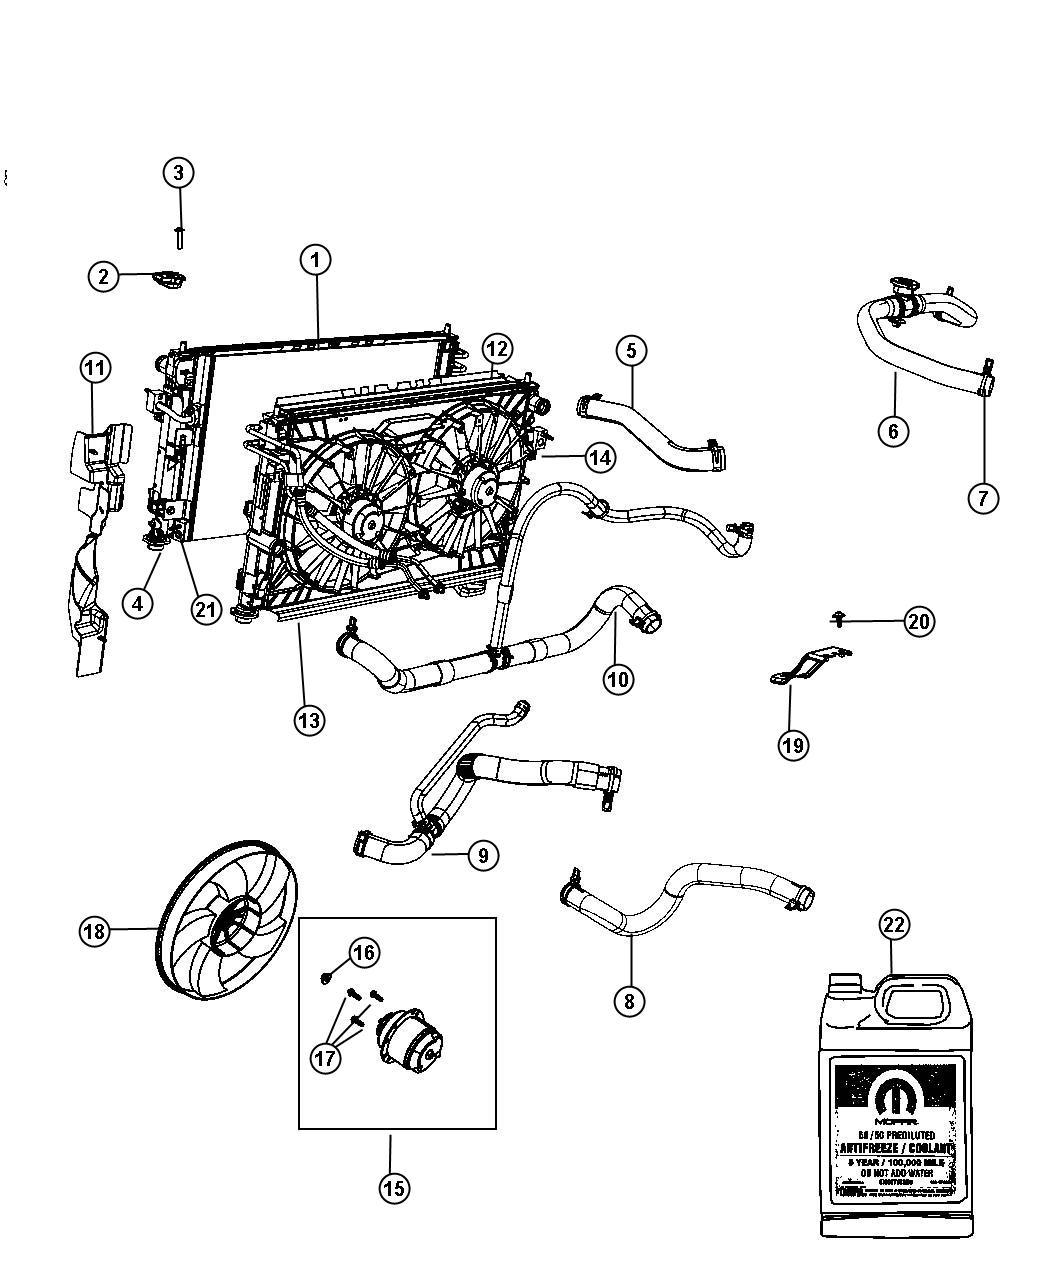 2007 Chrysler Sebring Hose. Radiator inlet. [nha]. Cooler